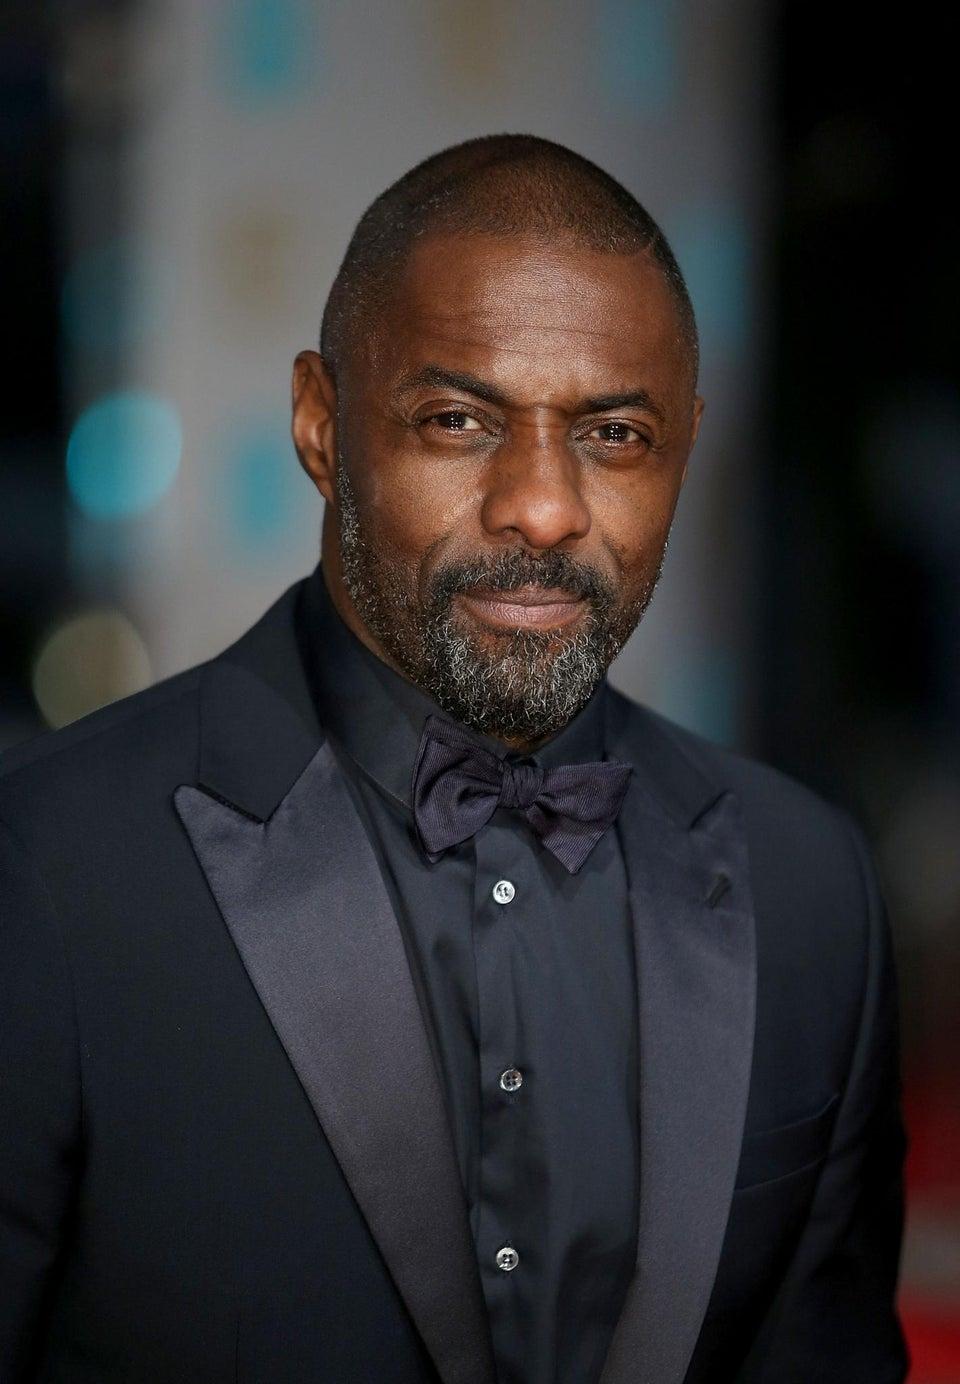 Hear Idris Elba as Shere Khan in 'The Jungle Book'